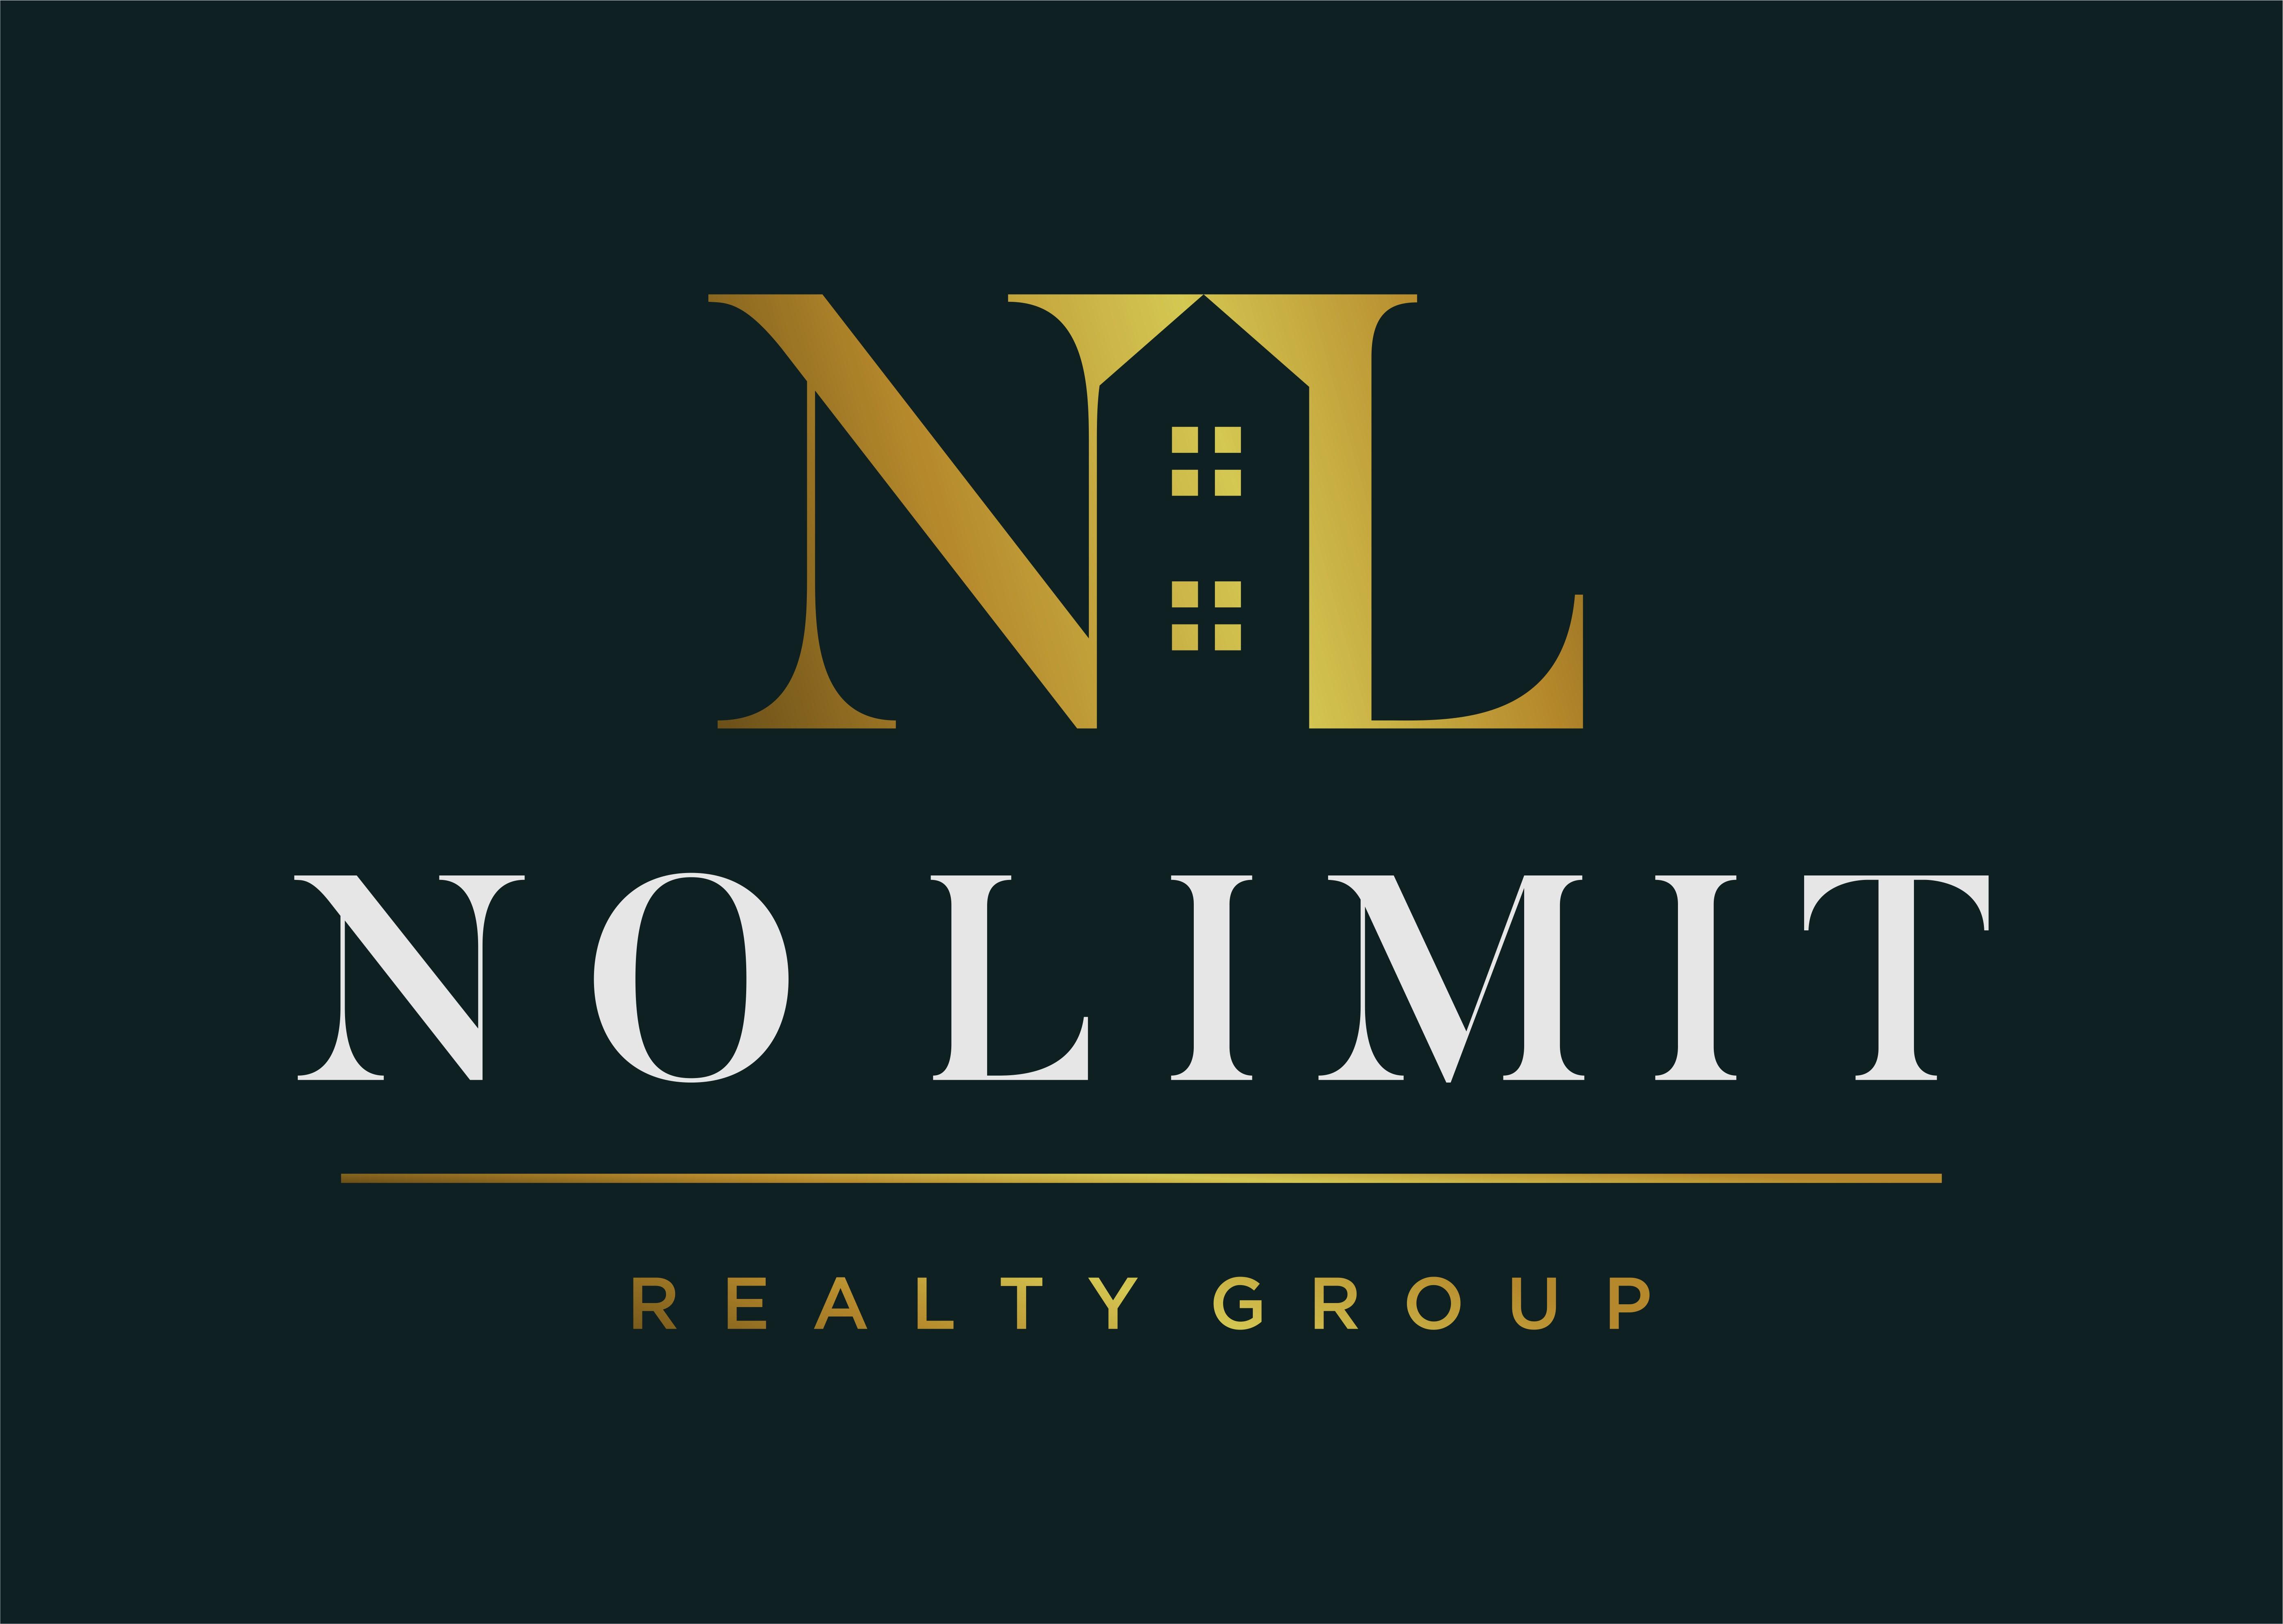 Modern, Hip, Sleek Real Estate team logo